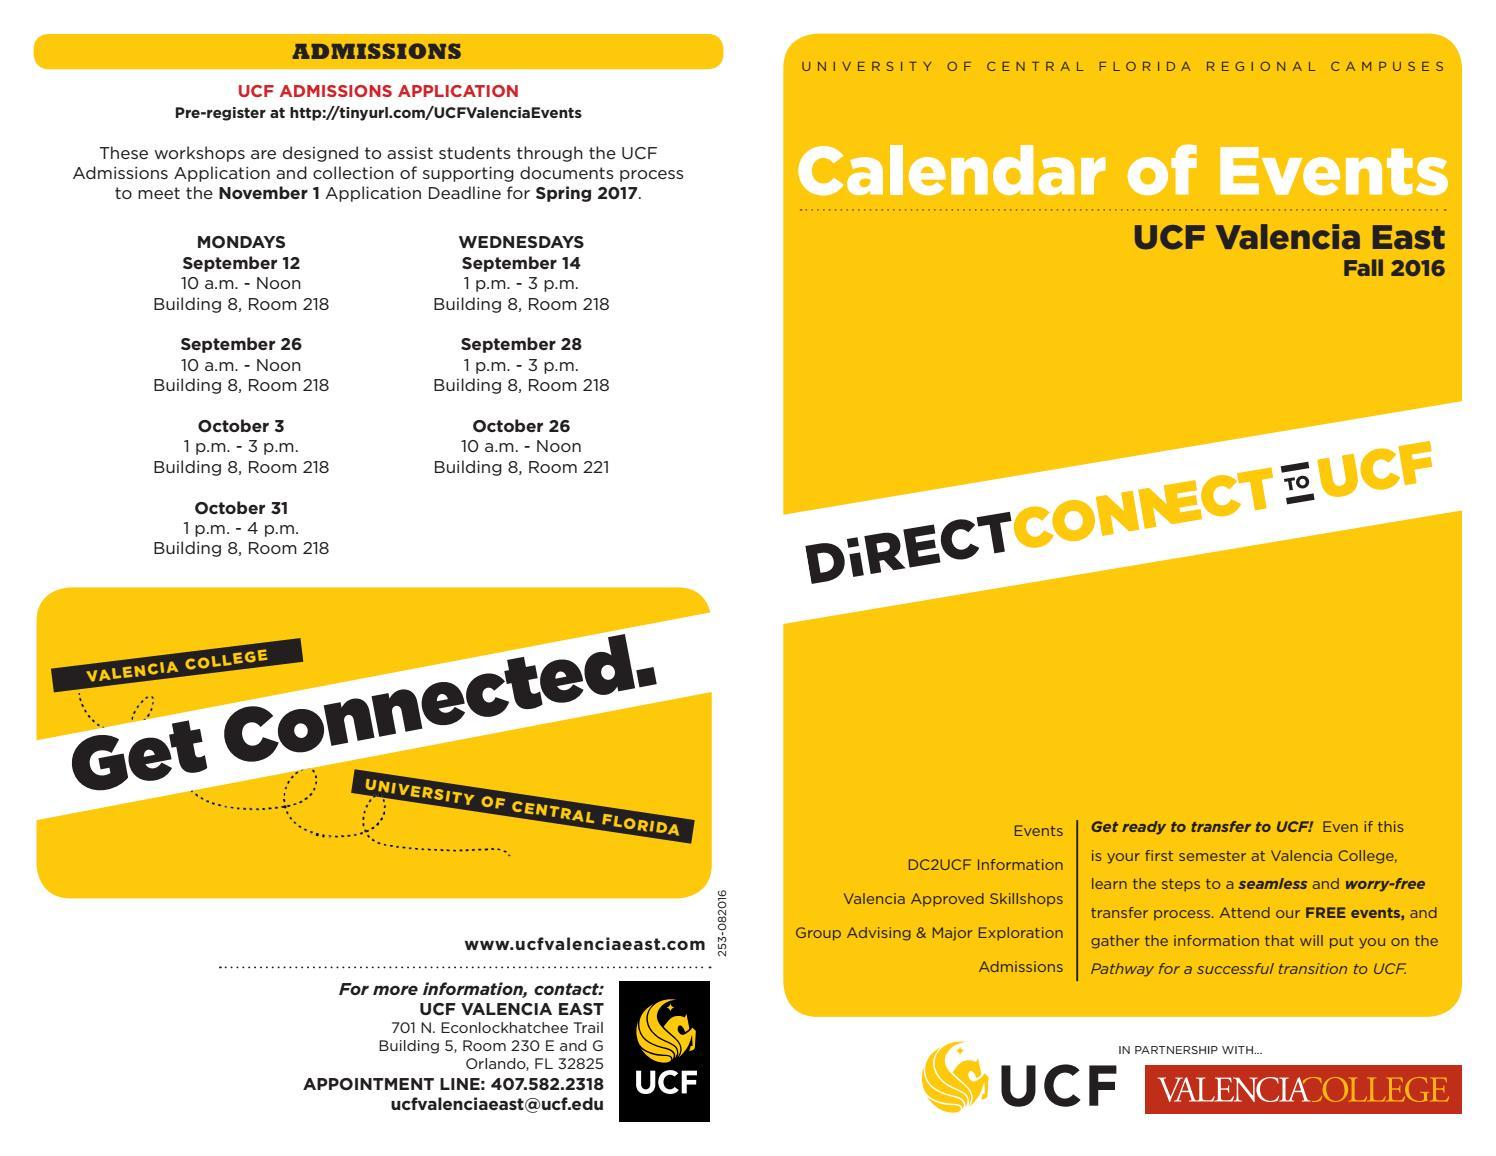 Valencia Calendar.253 082015 Calendar Of Events Fall 16 Valencia East Print 2 By Ucf